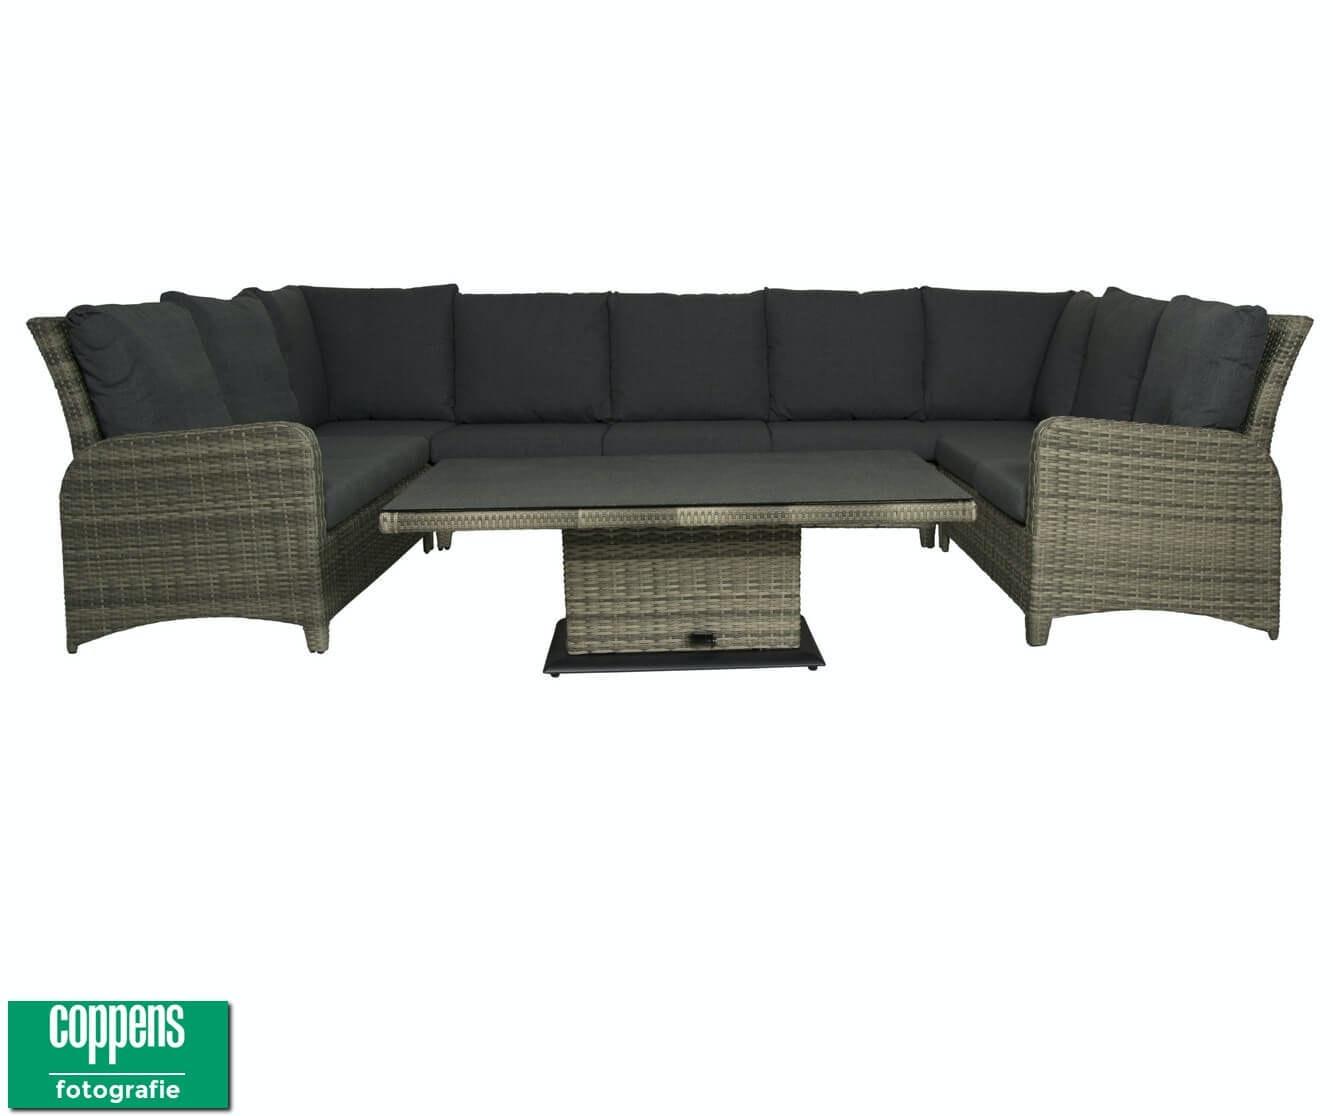 Qopps Aruba lounge dining hoekbank met sandigo in hoogte verstelbare tuintafel 140